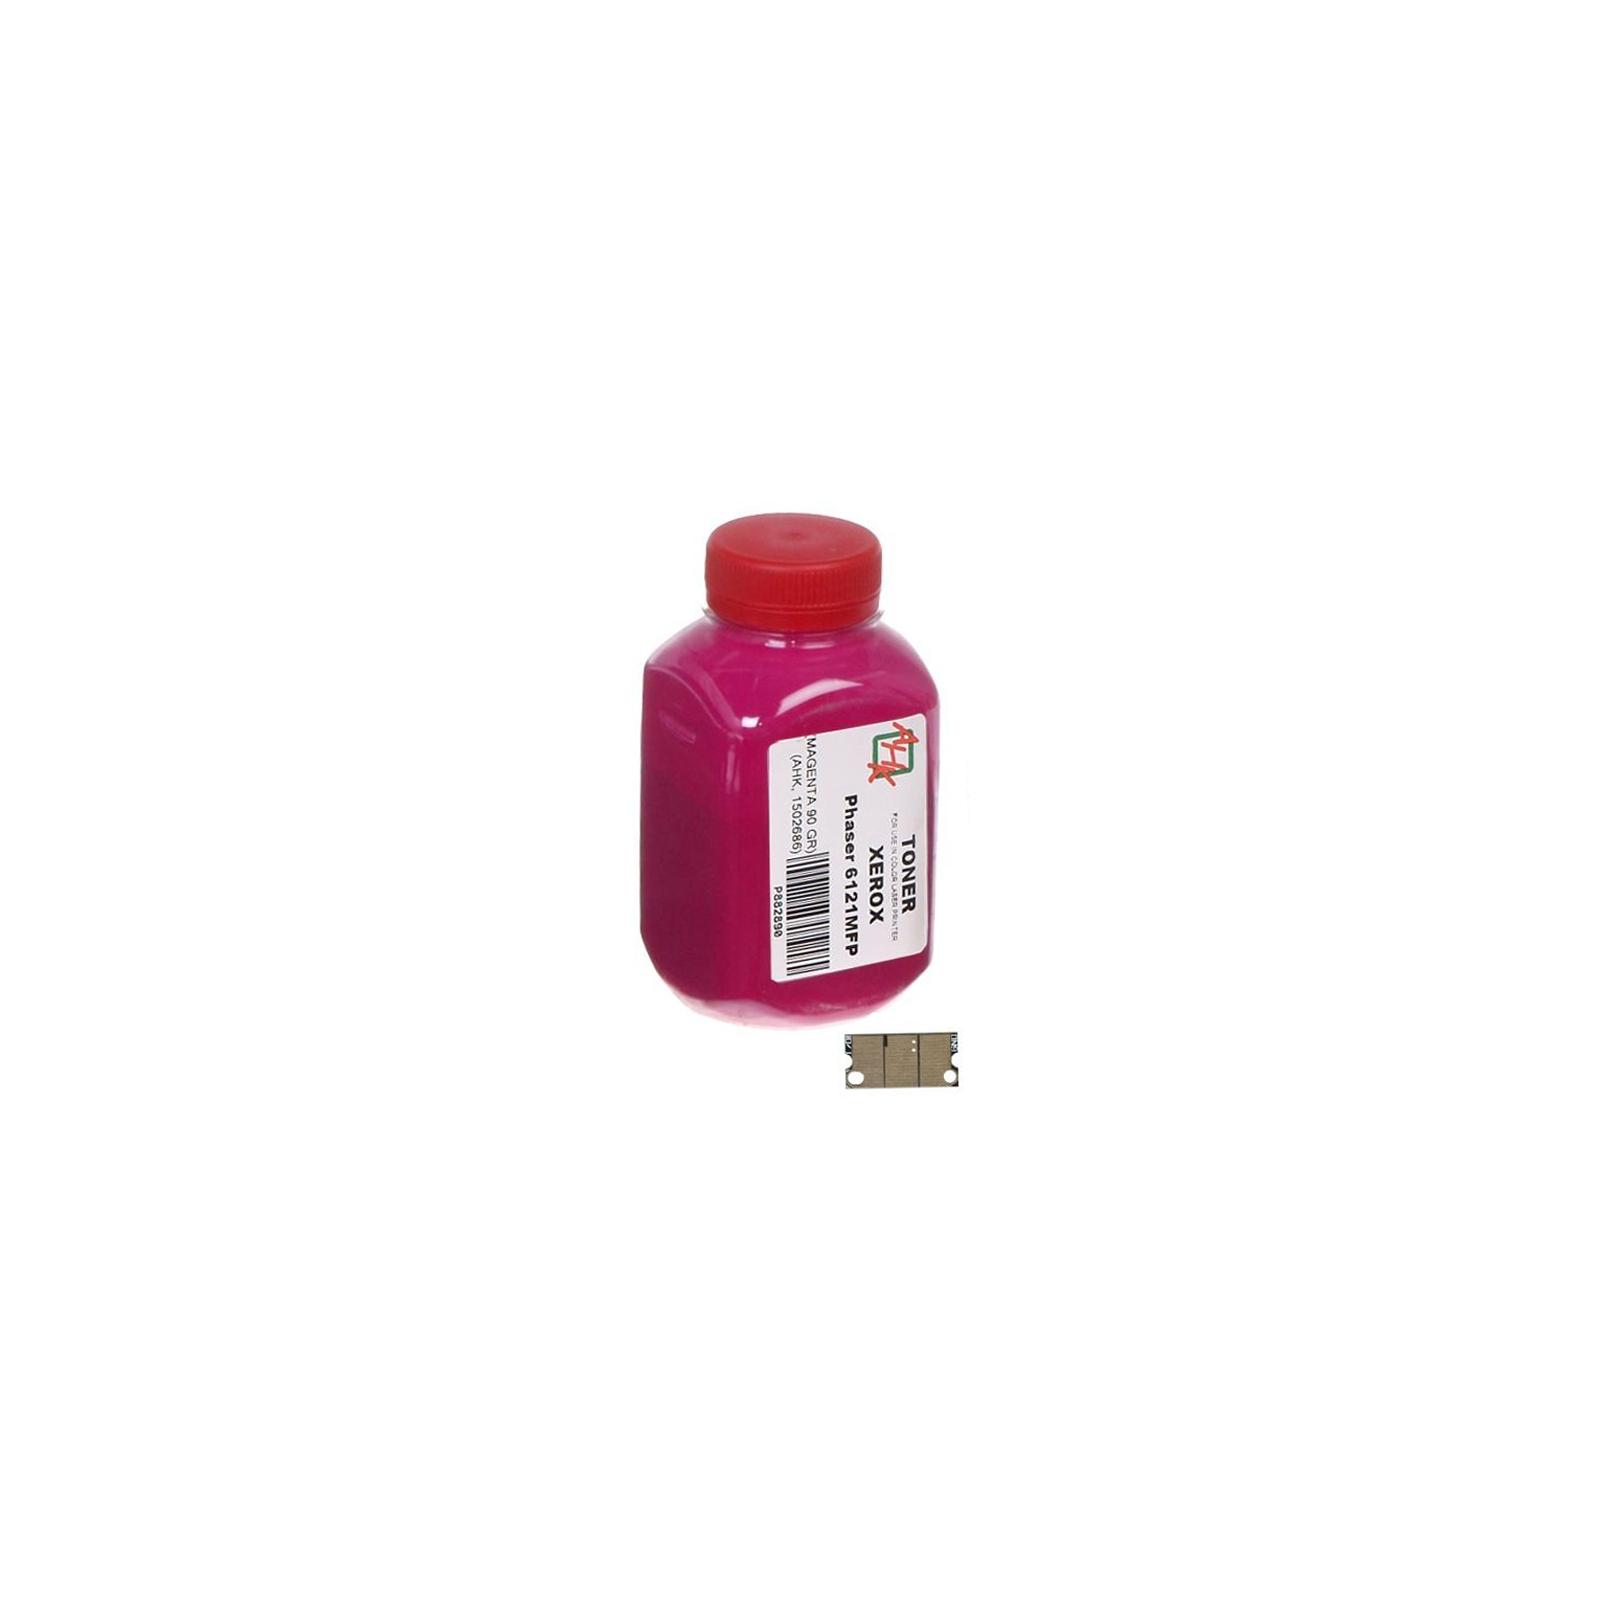 Тонер XEROX Phaser 6121MFP Magenta (+ чип ) АНК (1502687)